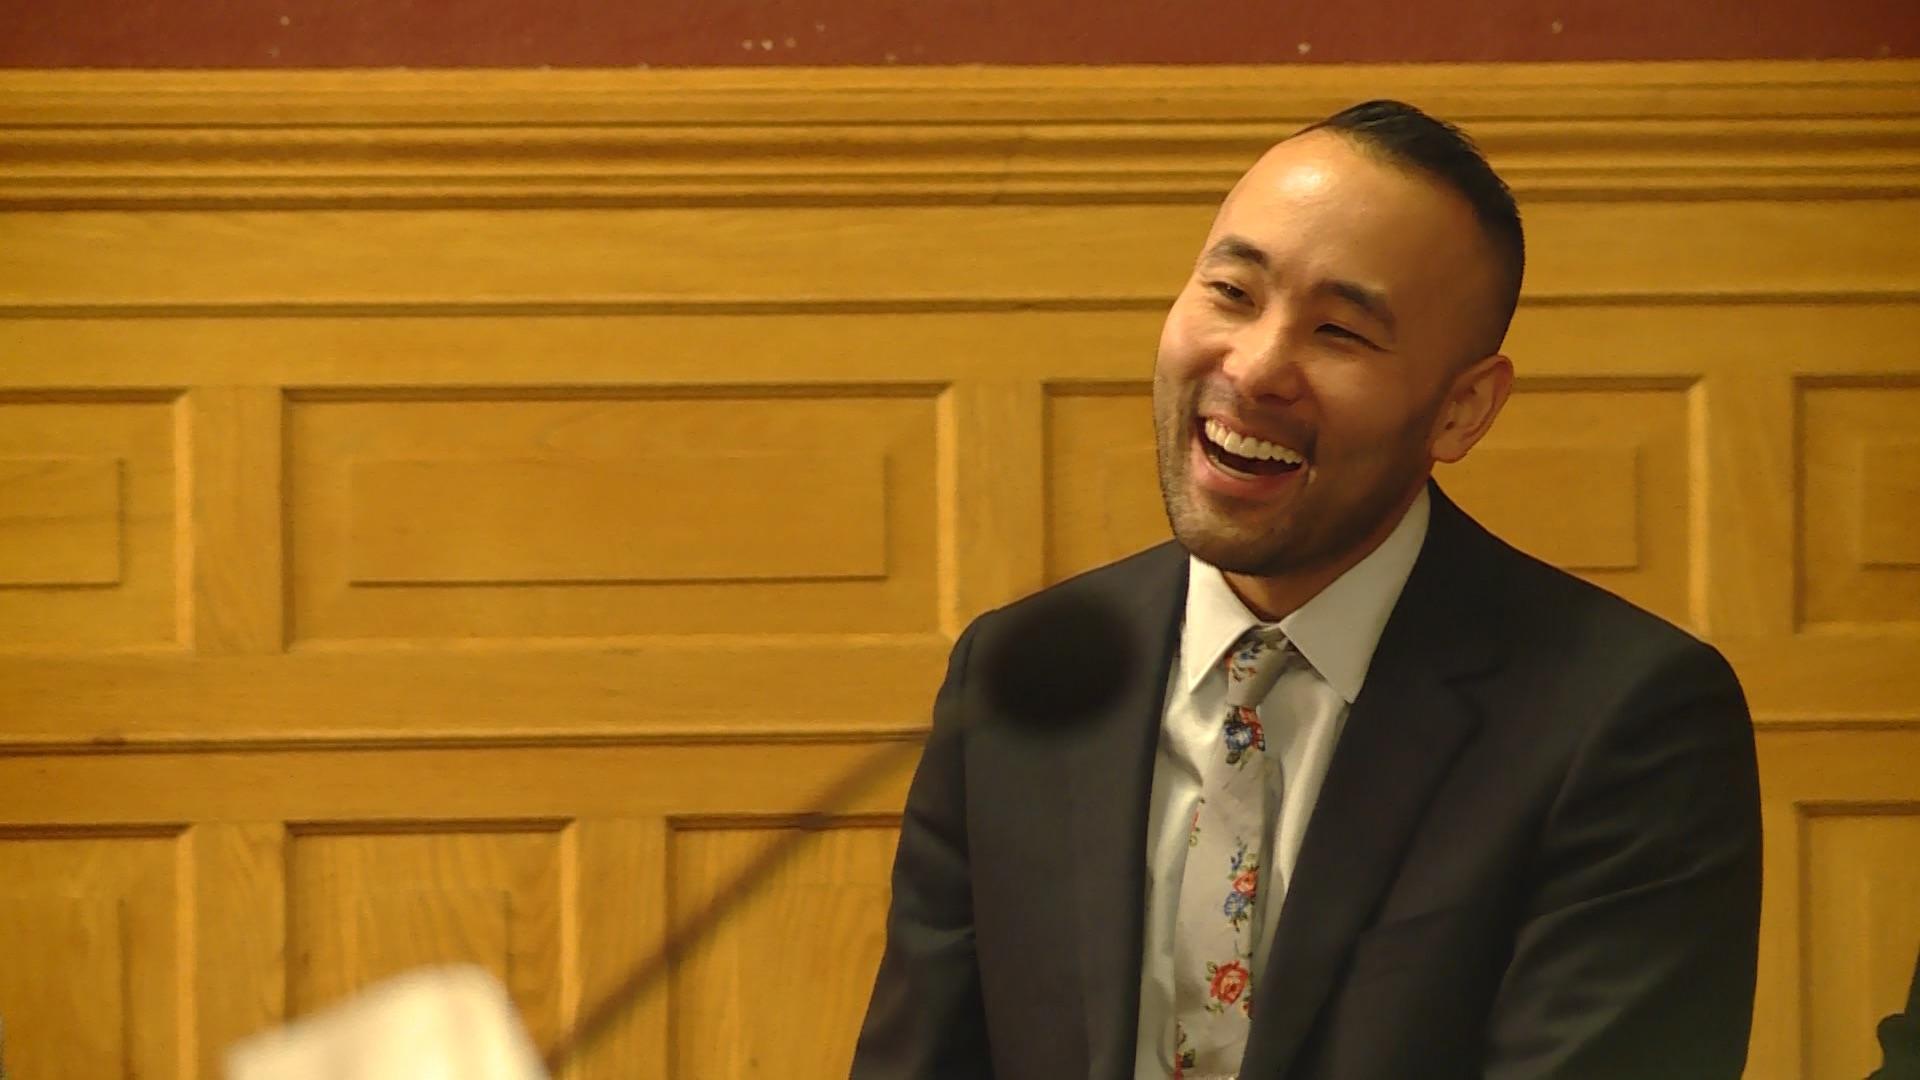 Darin Masao Mano addresses the Salt Lake City Council on Tuesday, Jan. 21, 2020.